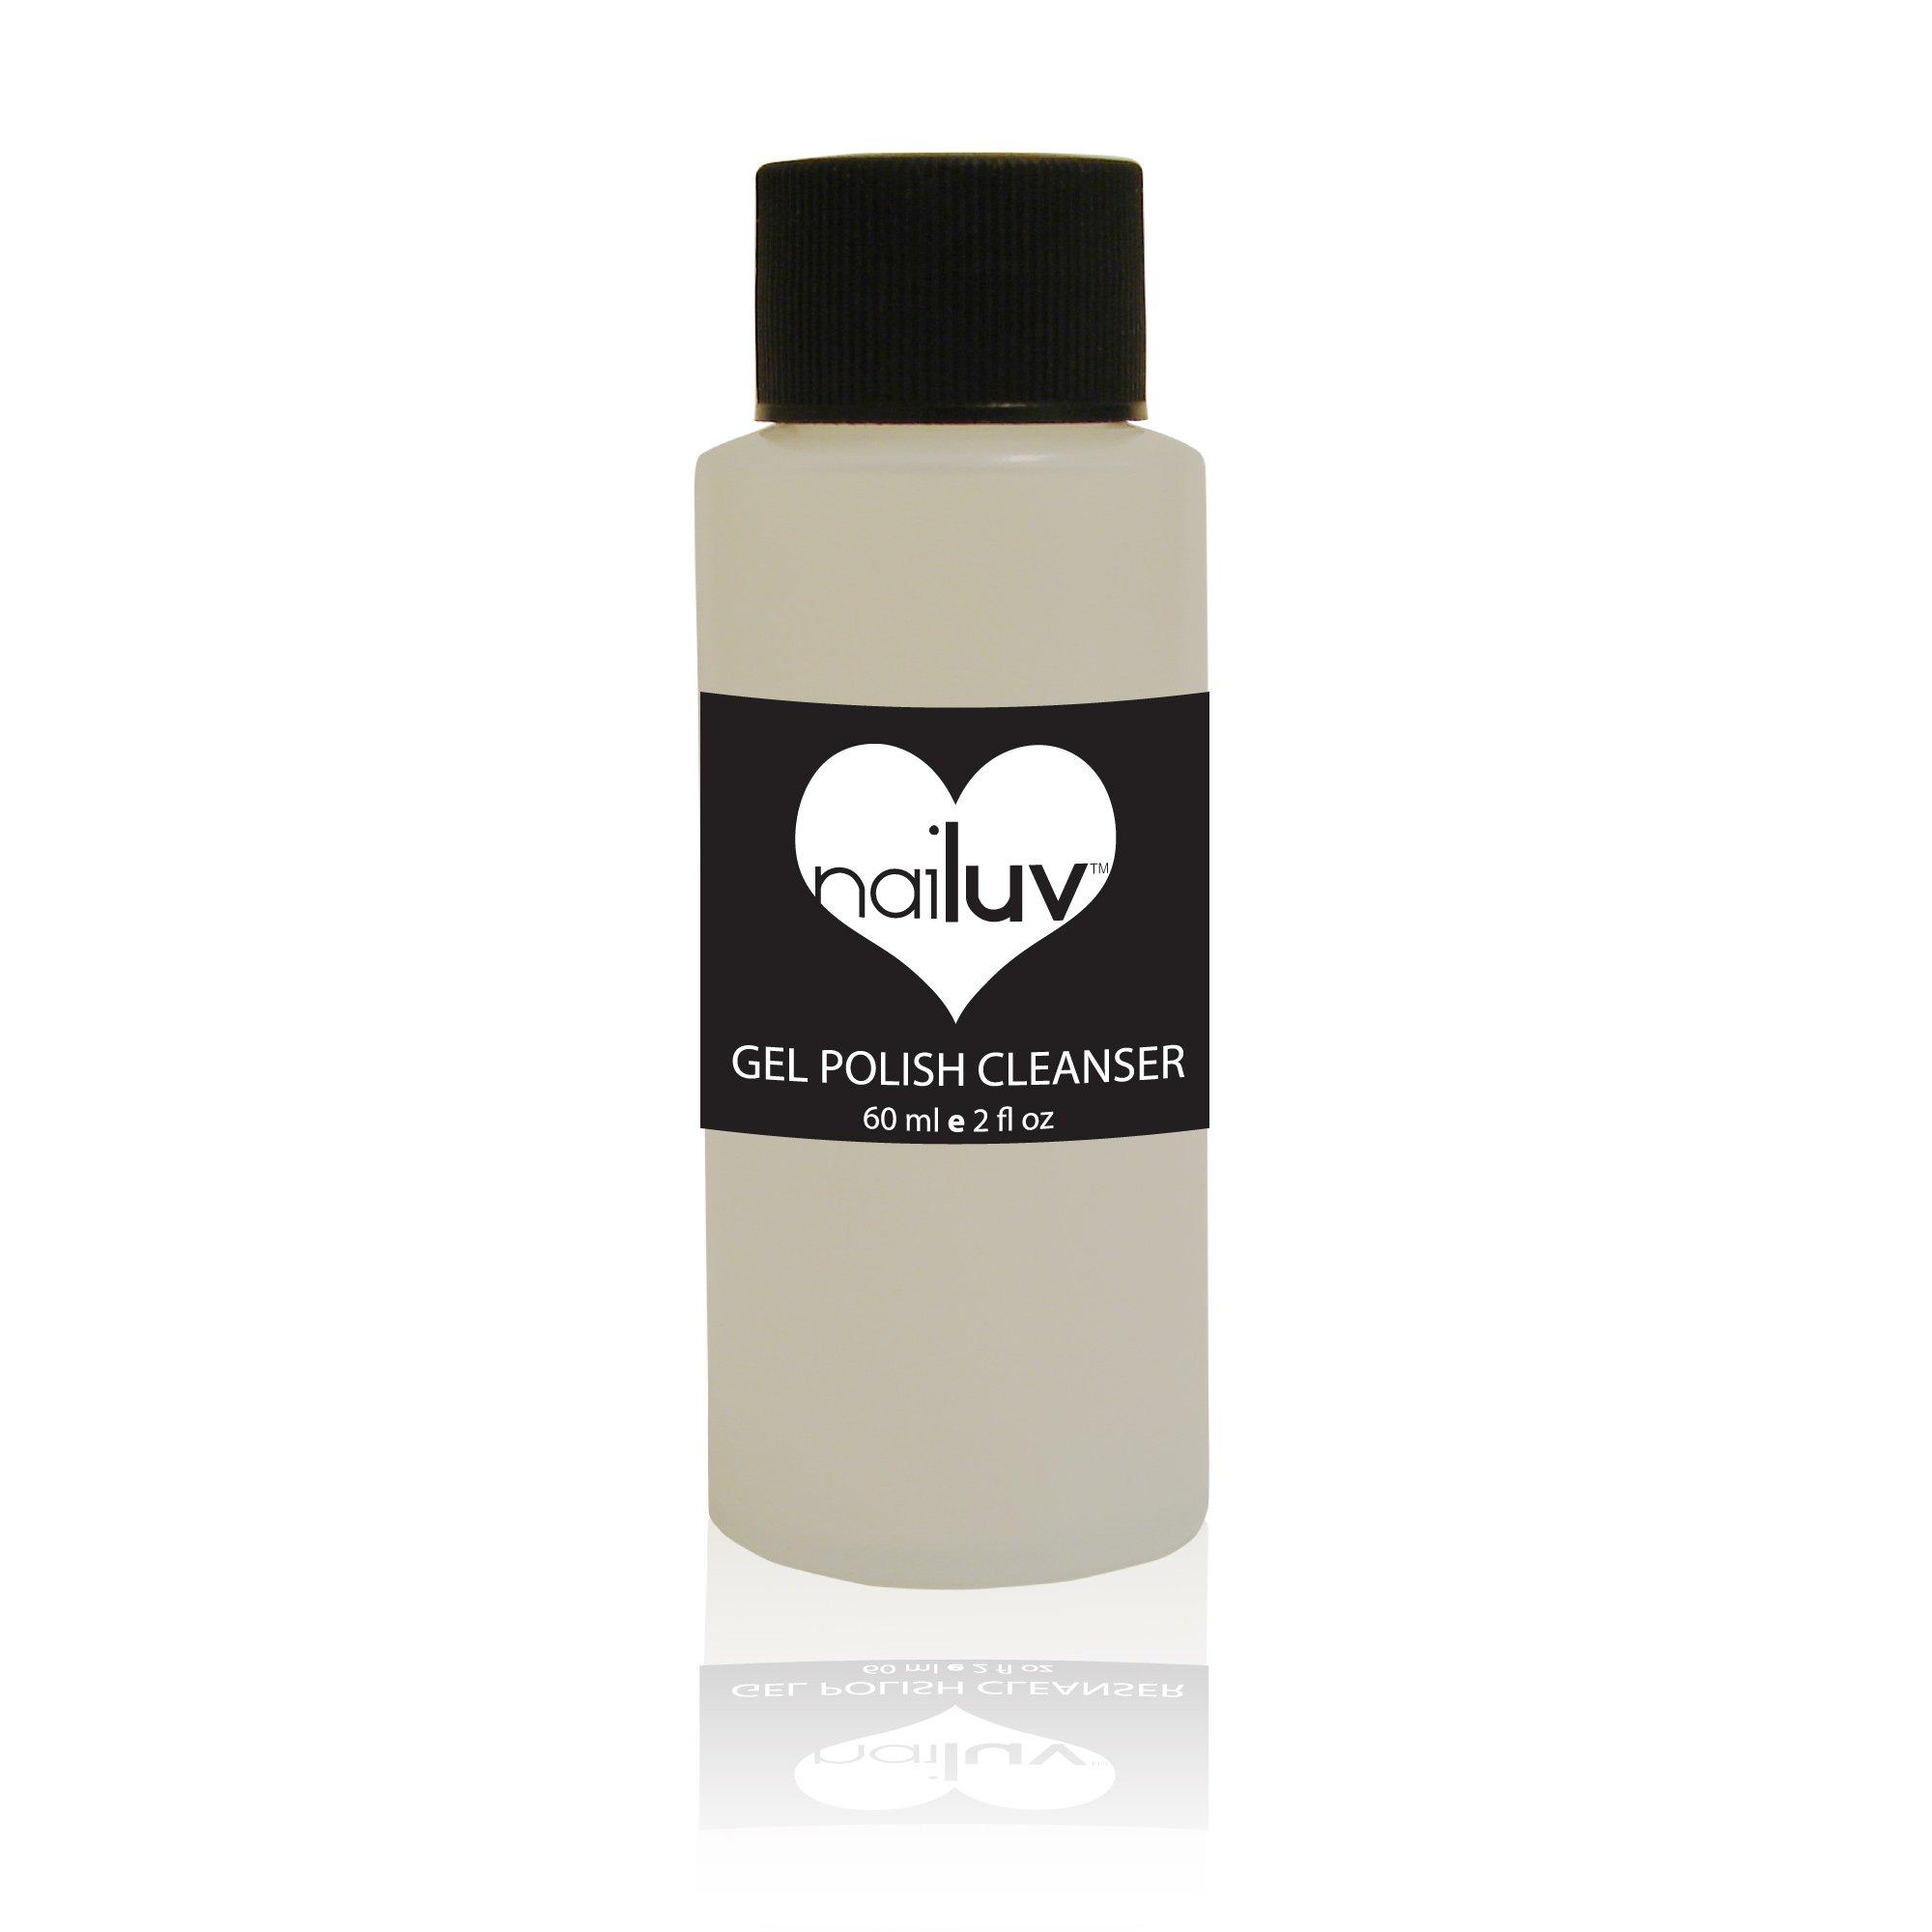 Nailuv 6019 Gel Nail Polish - Cleanser